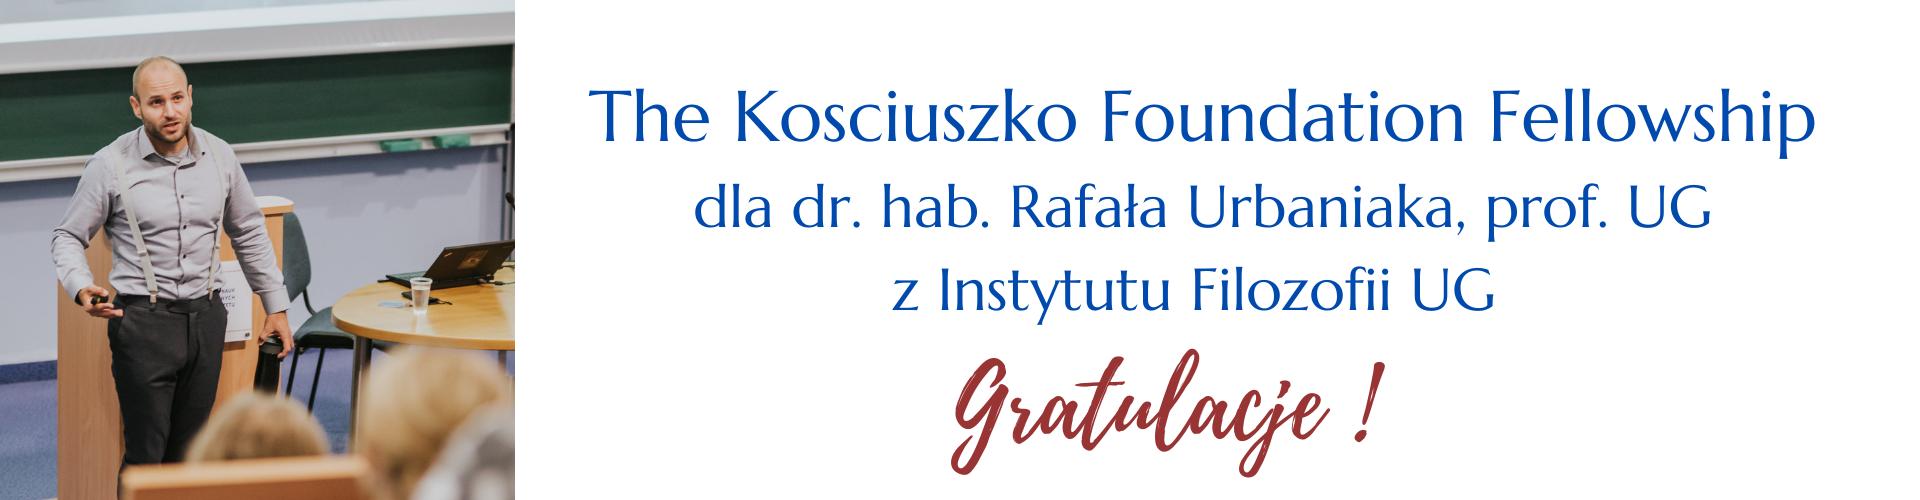 The Kosciuszko Foundation Fellowship dla dr. hab. Rafała Urbaniaka, prof. UG